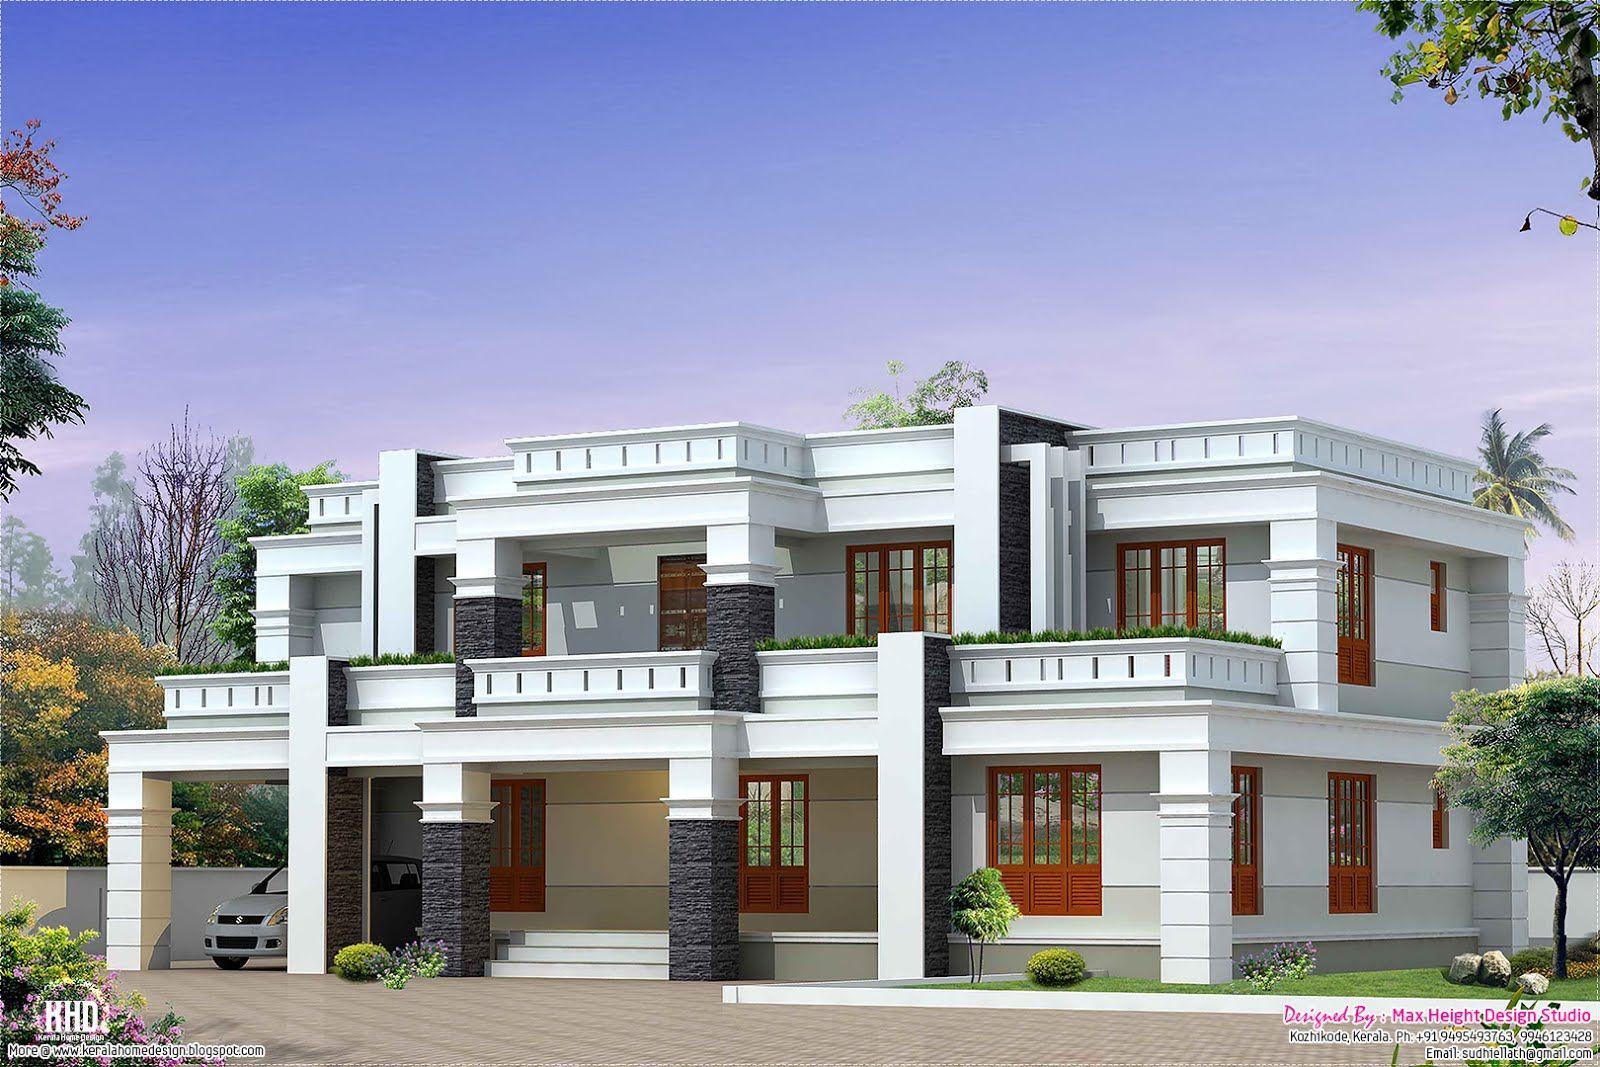 Stunning Parapet Roof Home Design Gallery - Interior Design Ideas ...